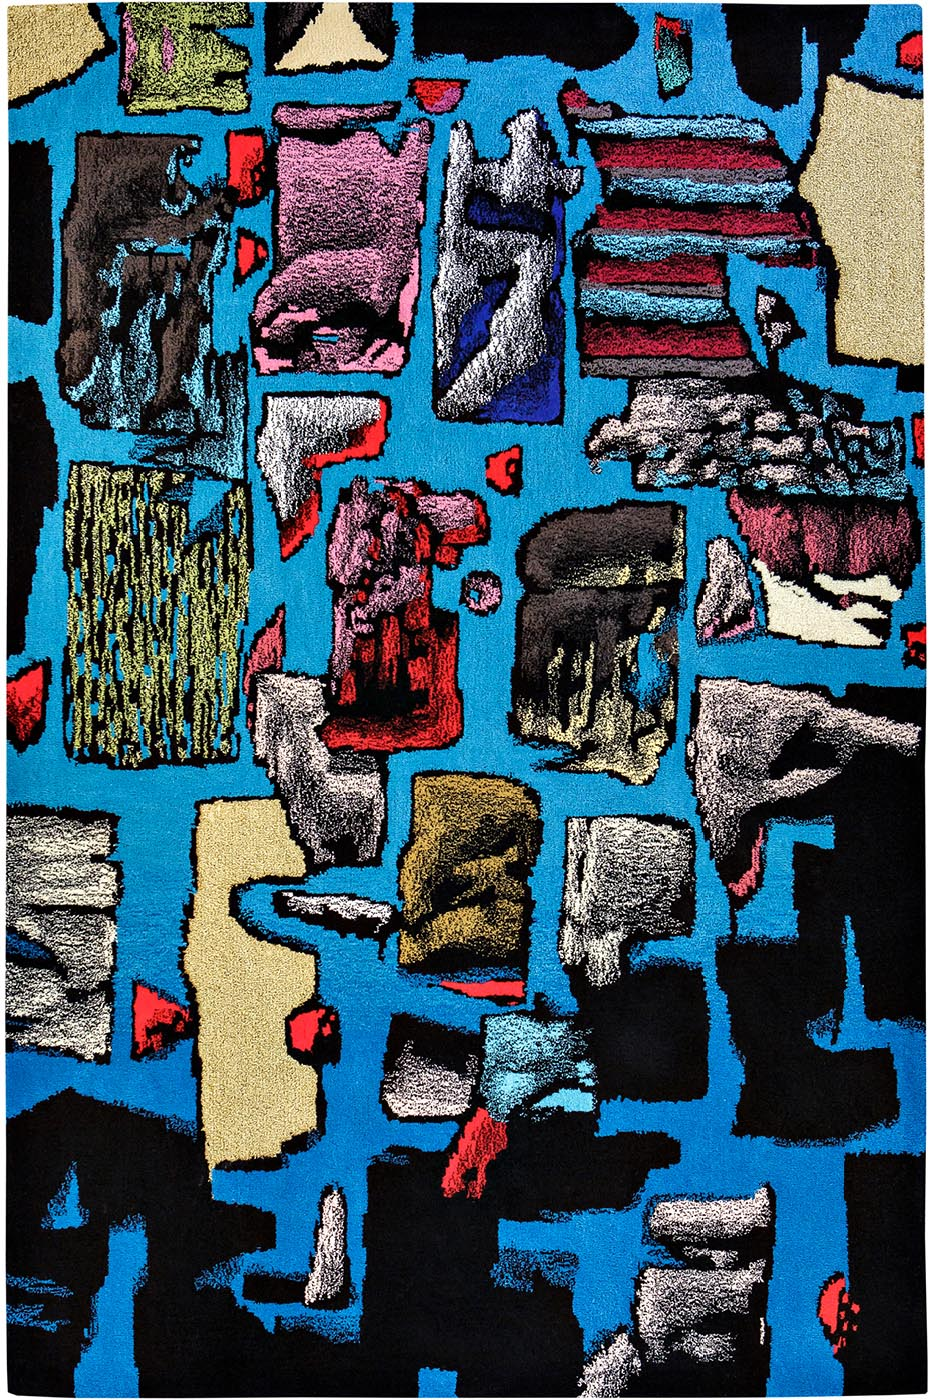 Tapis / Rug Blue Kit by Julien Colombier